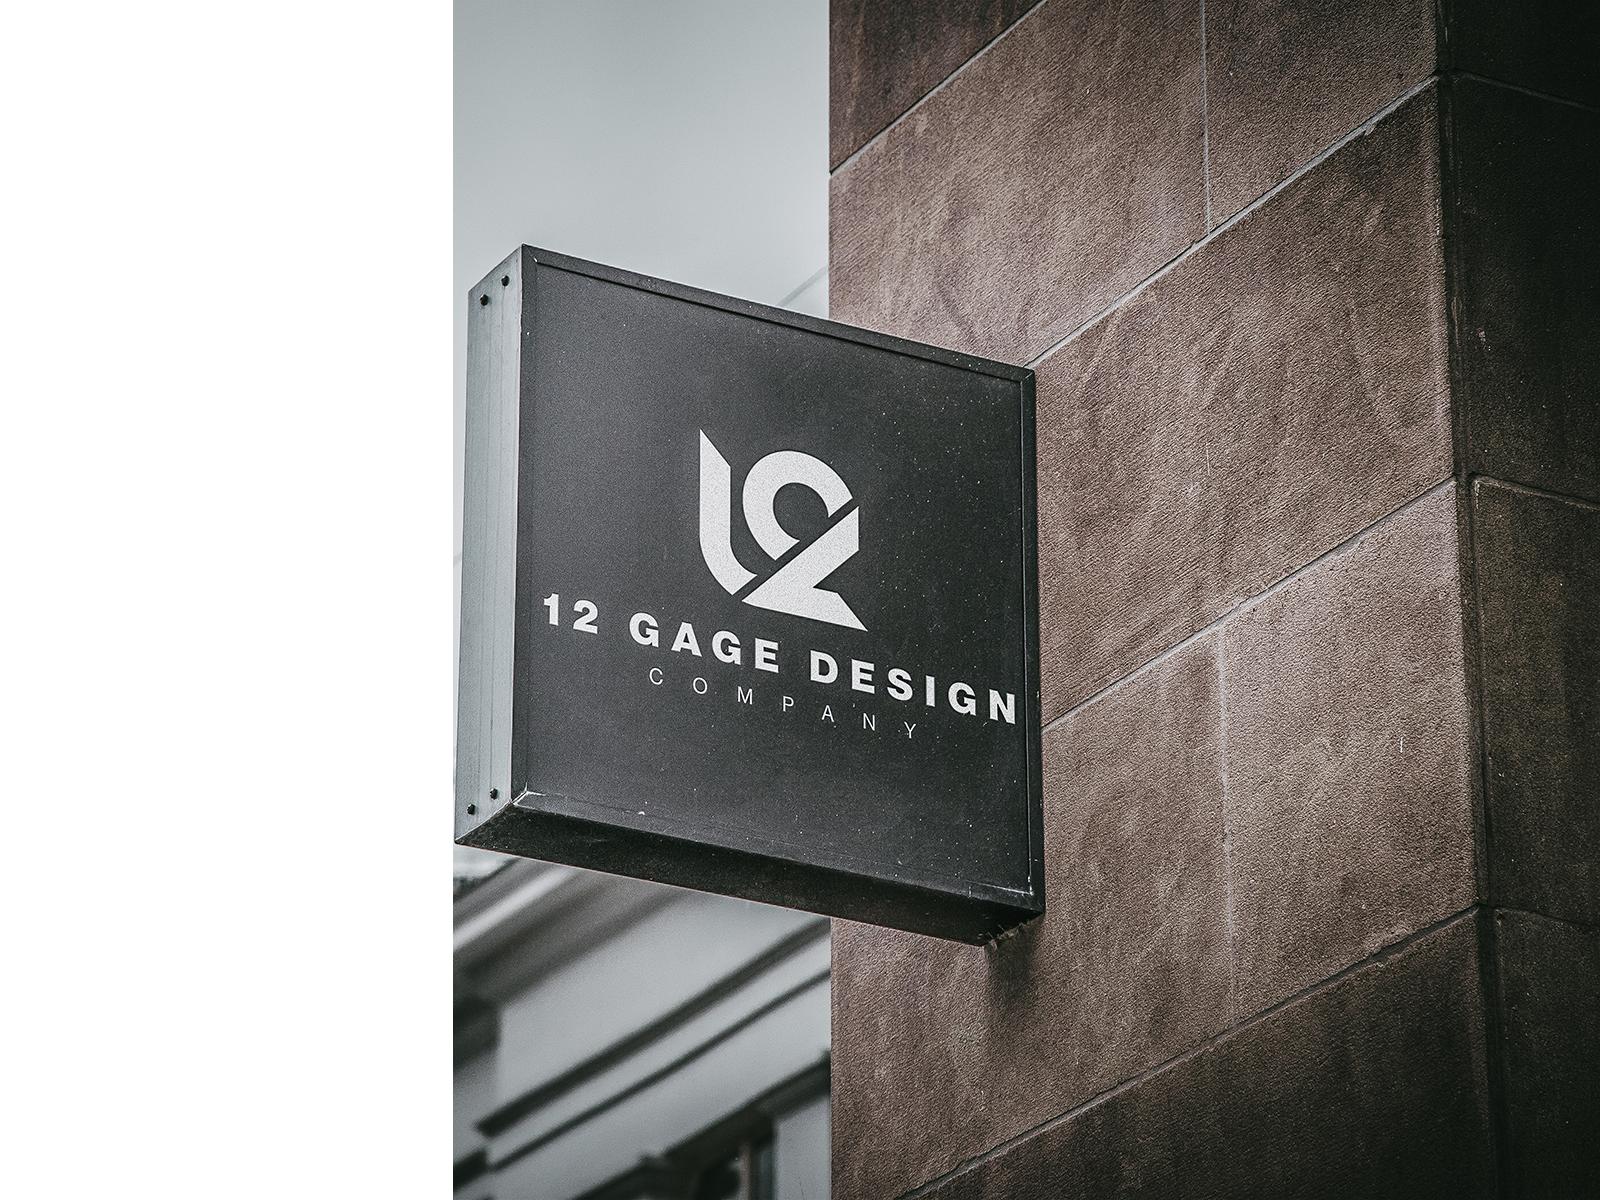 12 gage design sign